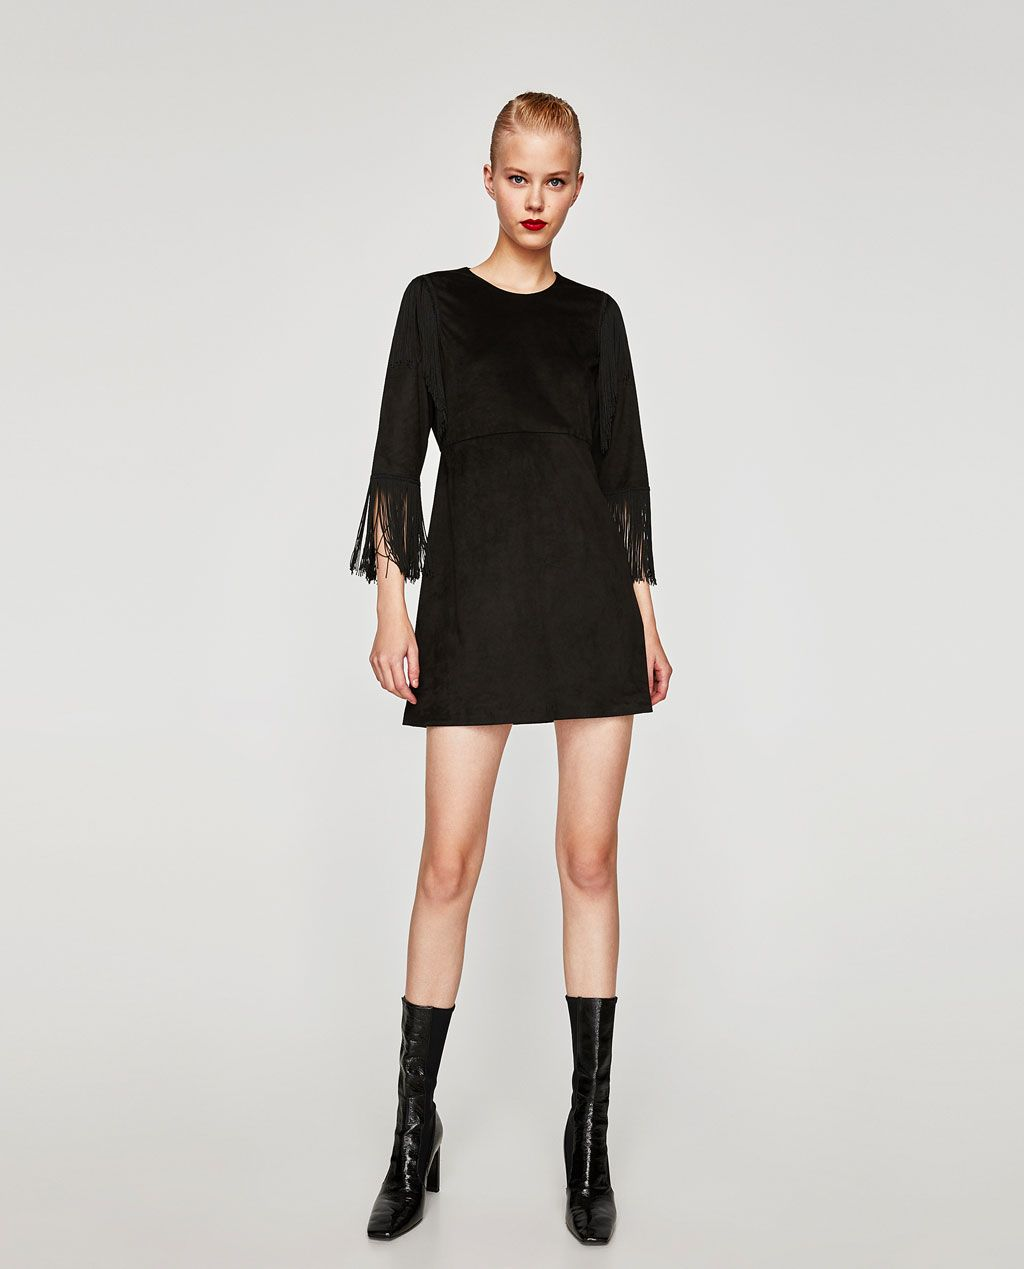 c7e61117 SUEDE EFFECT DRESS-Mini-DRESSES-WOMAN | ZARA United States Zara United  States